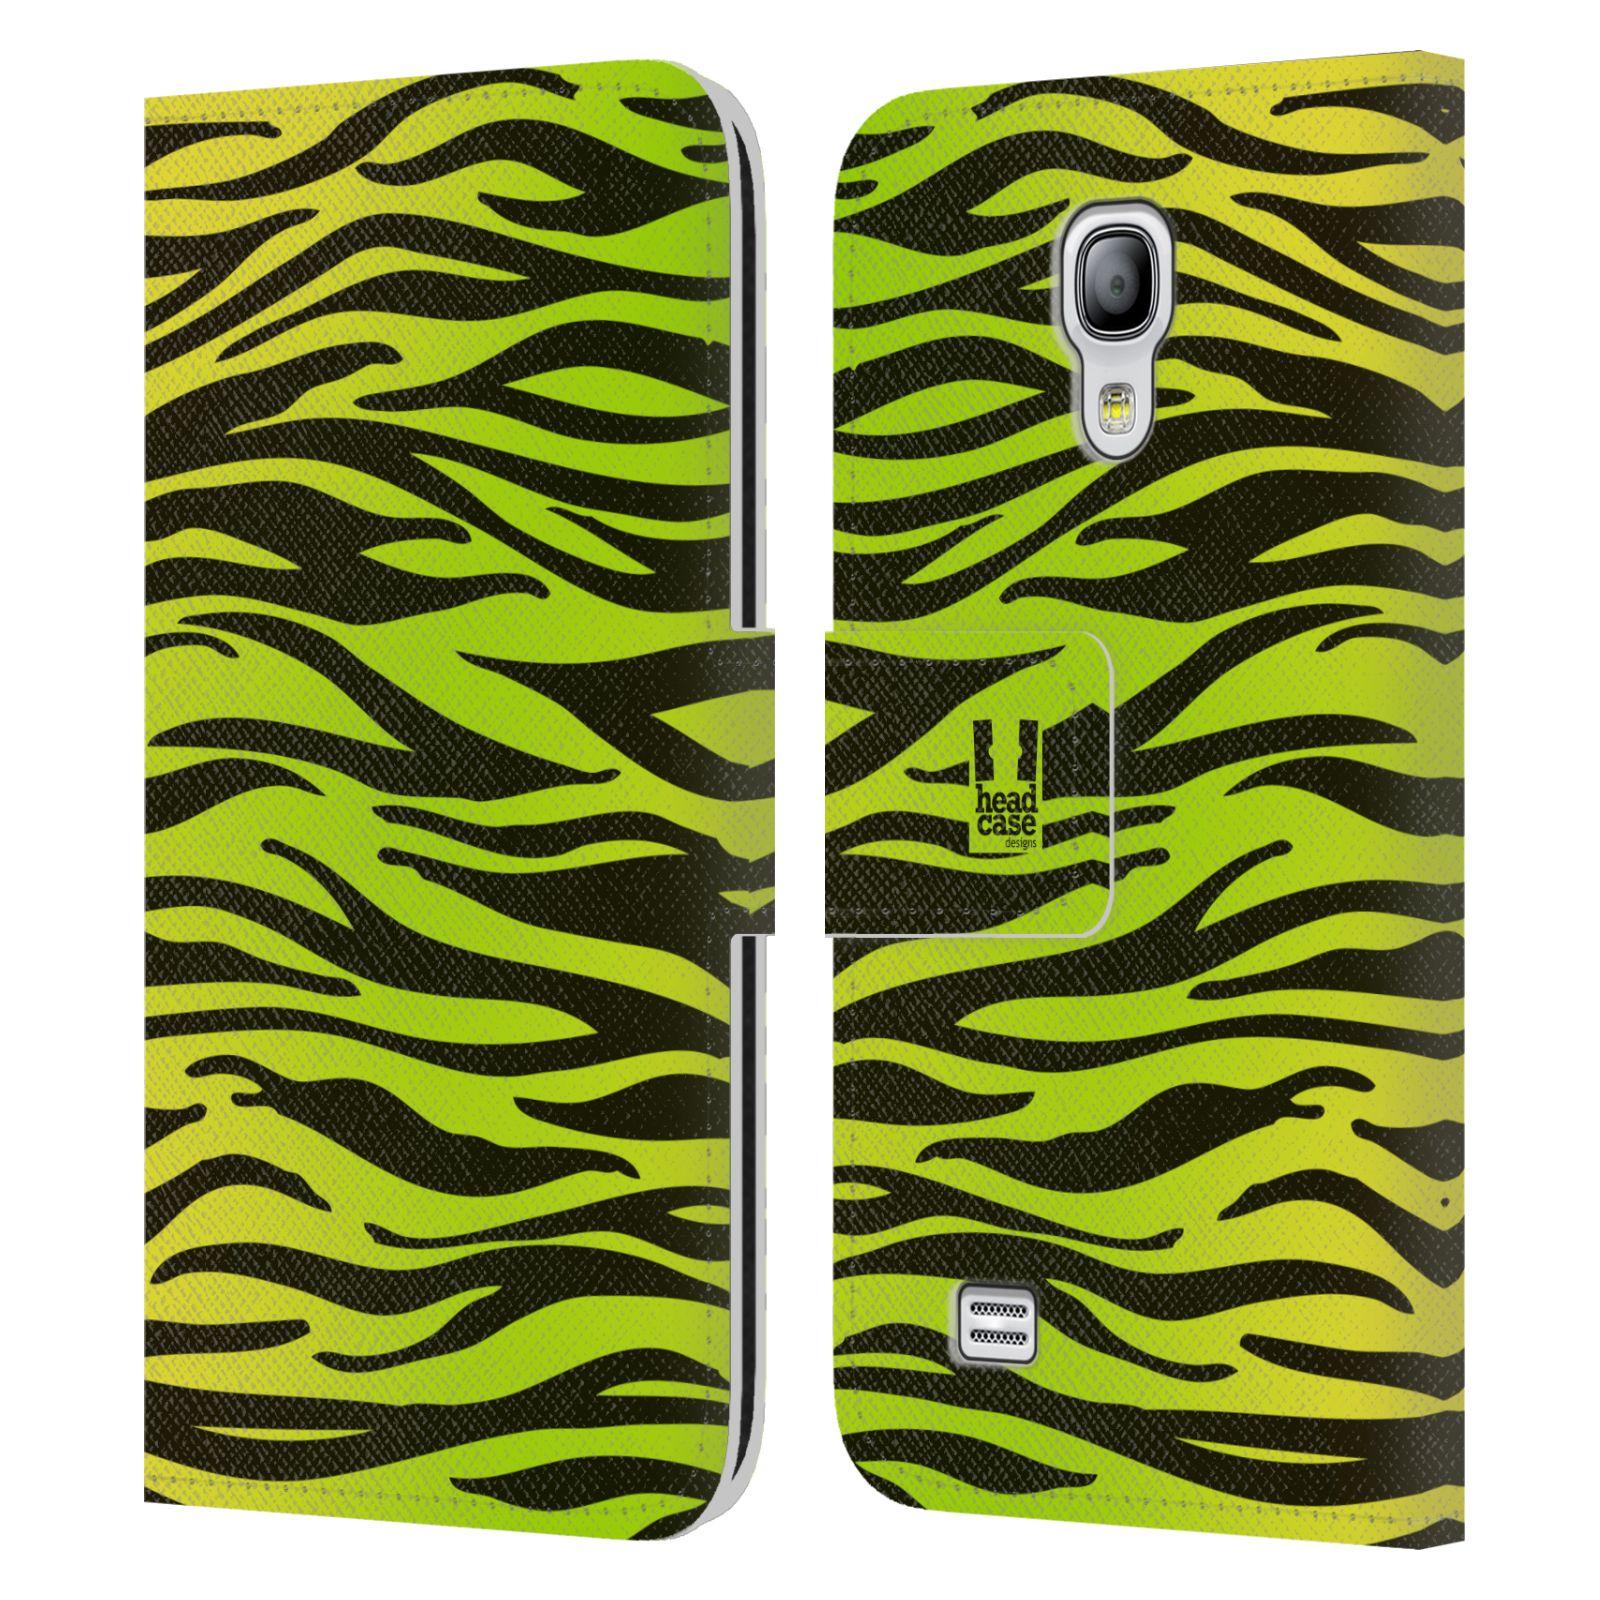 HEAD CASE Flipové pouzdro pro mobil Samsung Galaxy S4 MINI / S4 MINI DUOS Zvířecí barevné vzory žlutozelená zebra